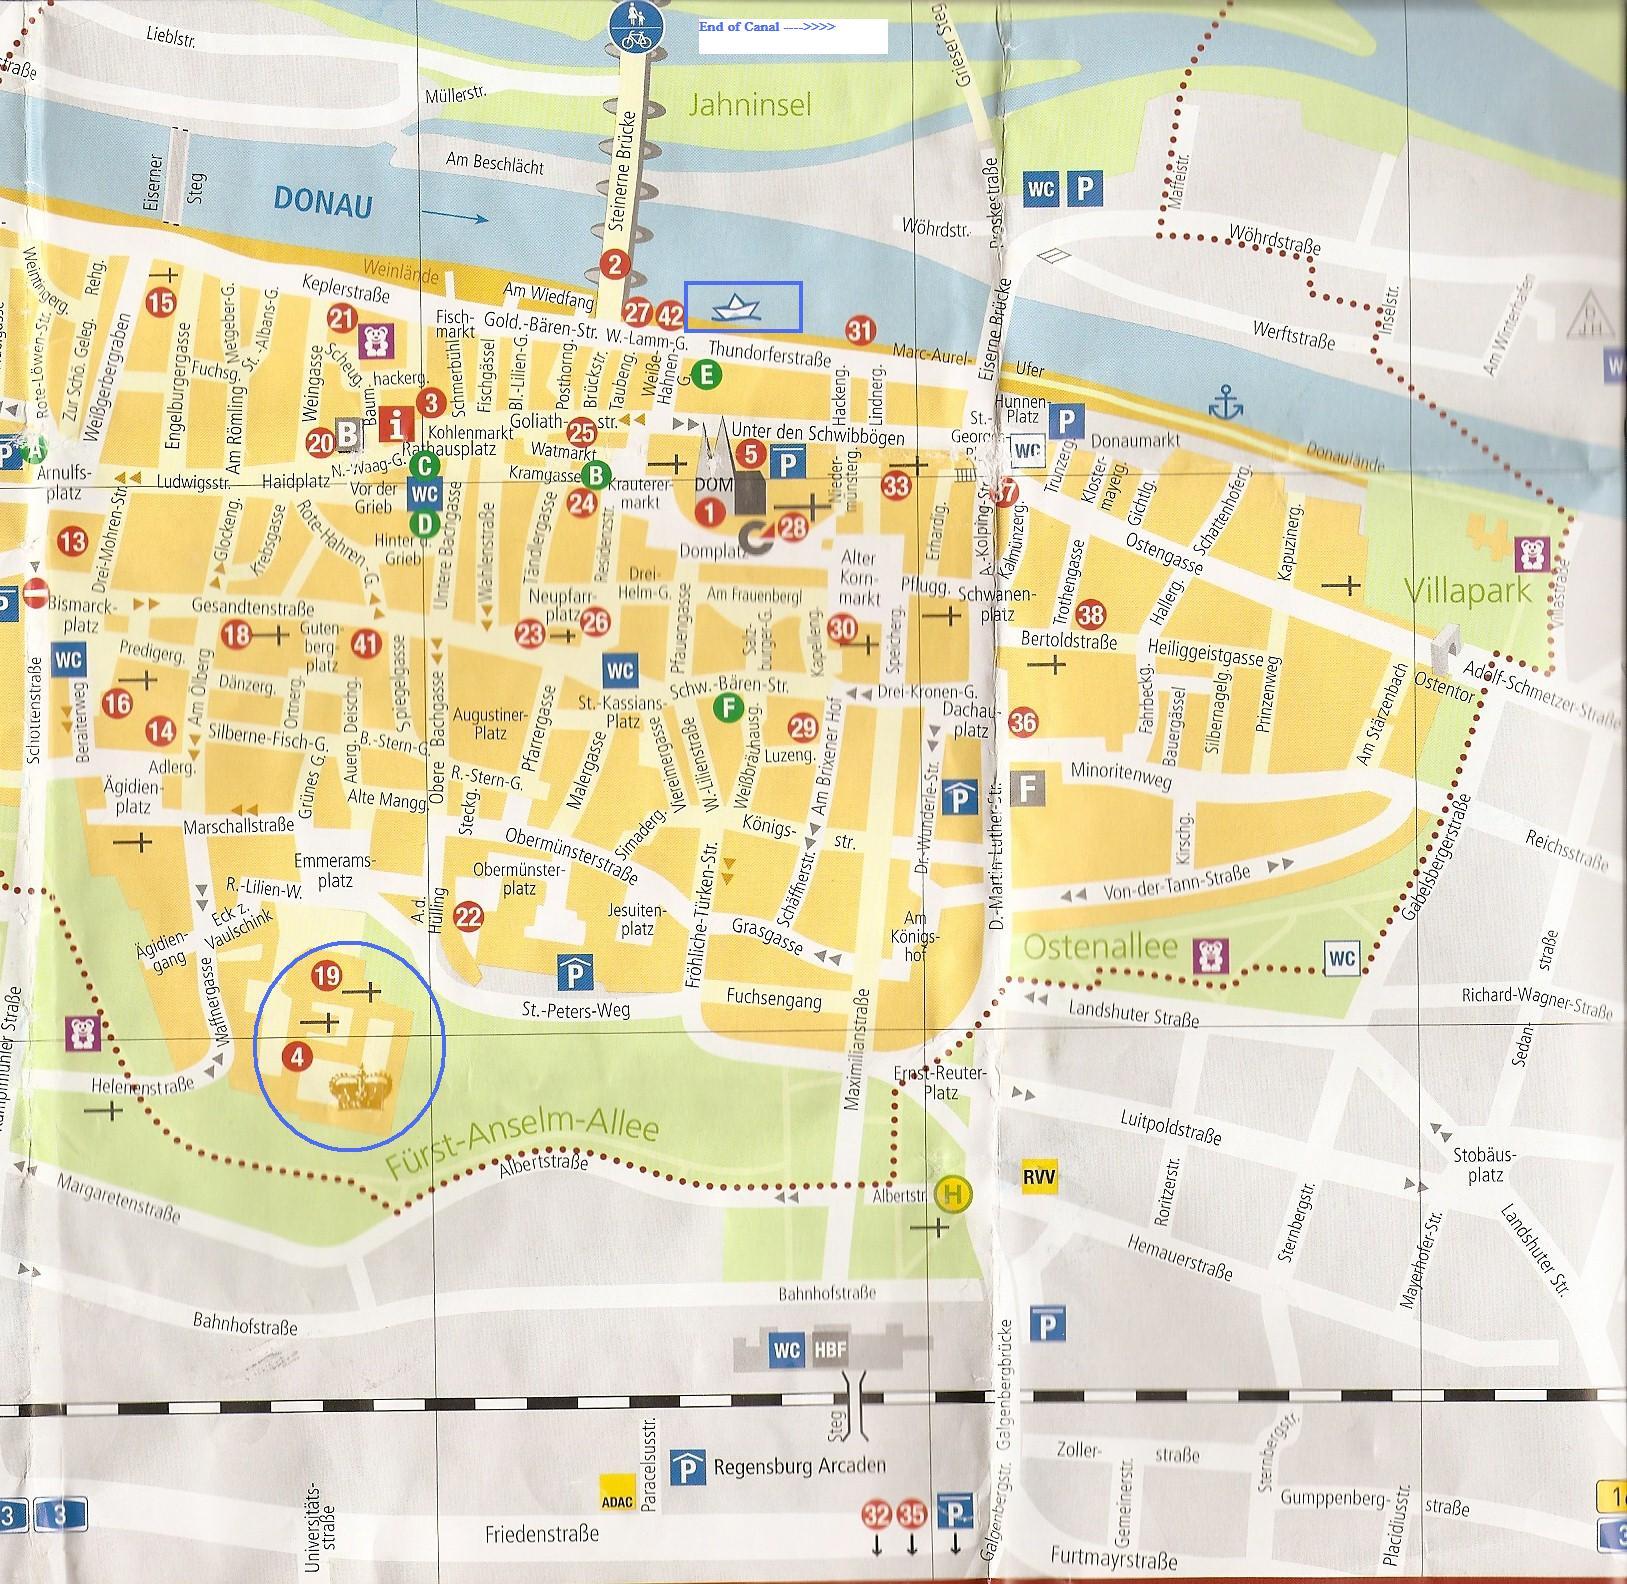 Regensburg Jims Journeys - Regensburg map